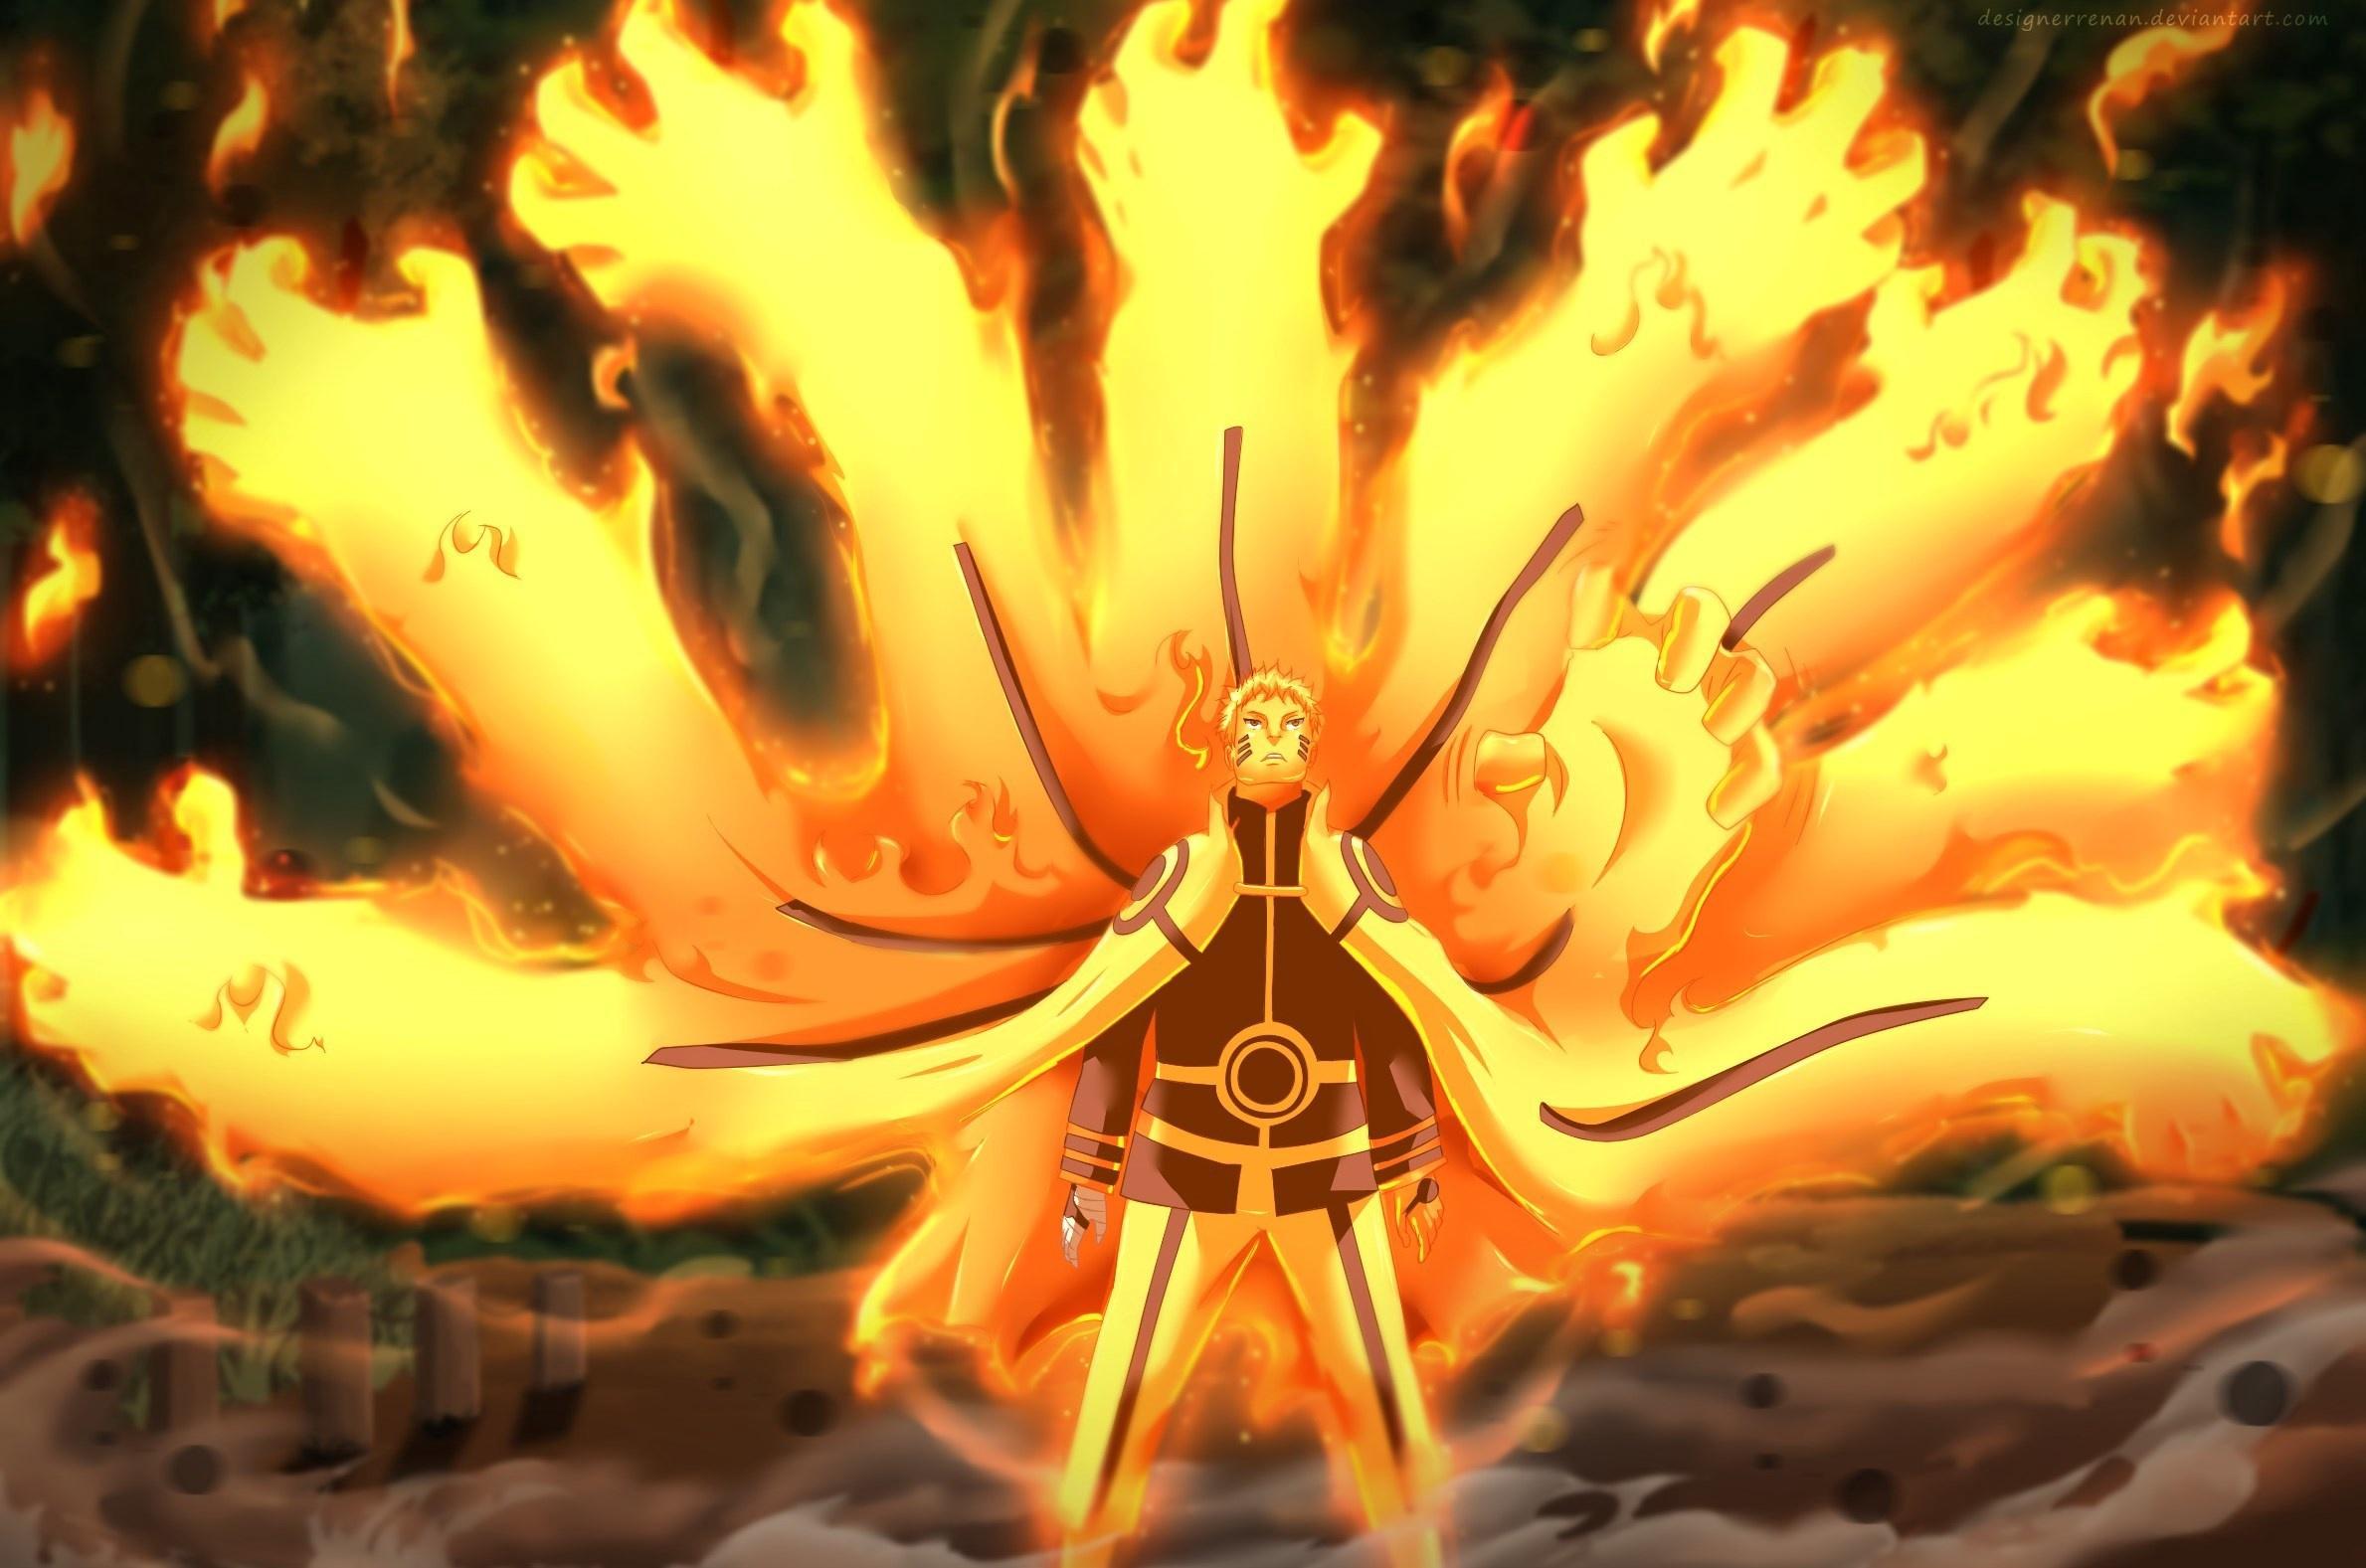 Best 47 Naruto Uzumaki Kyuubi Mode Wallpaper on